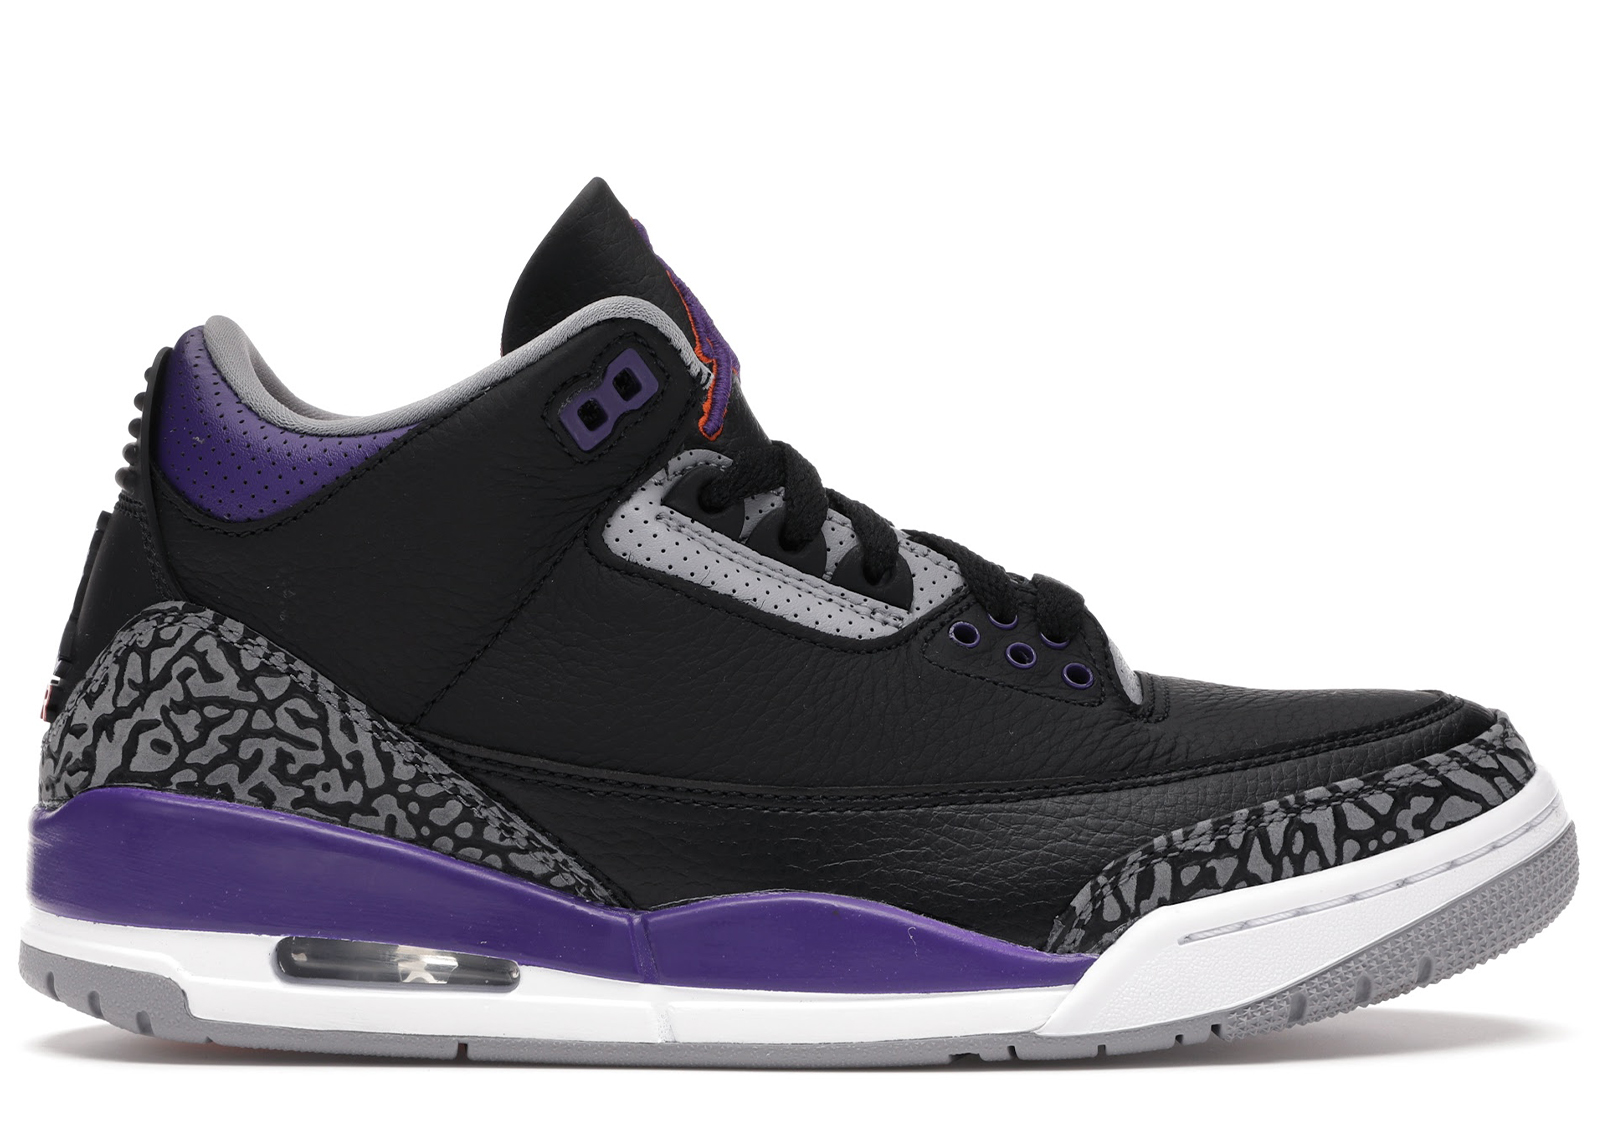 Acheter Air Jordan 3 Chaussures et sneakers neuves